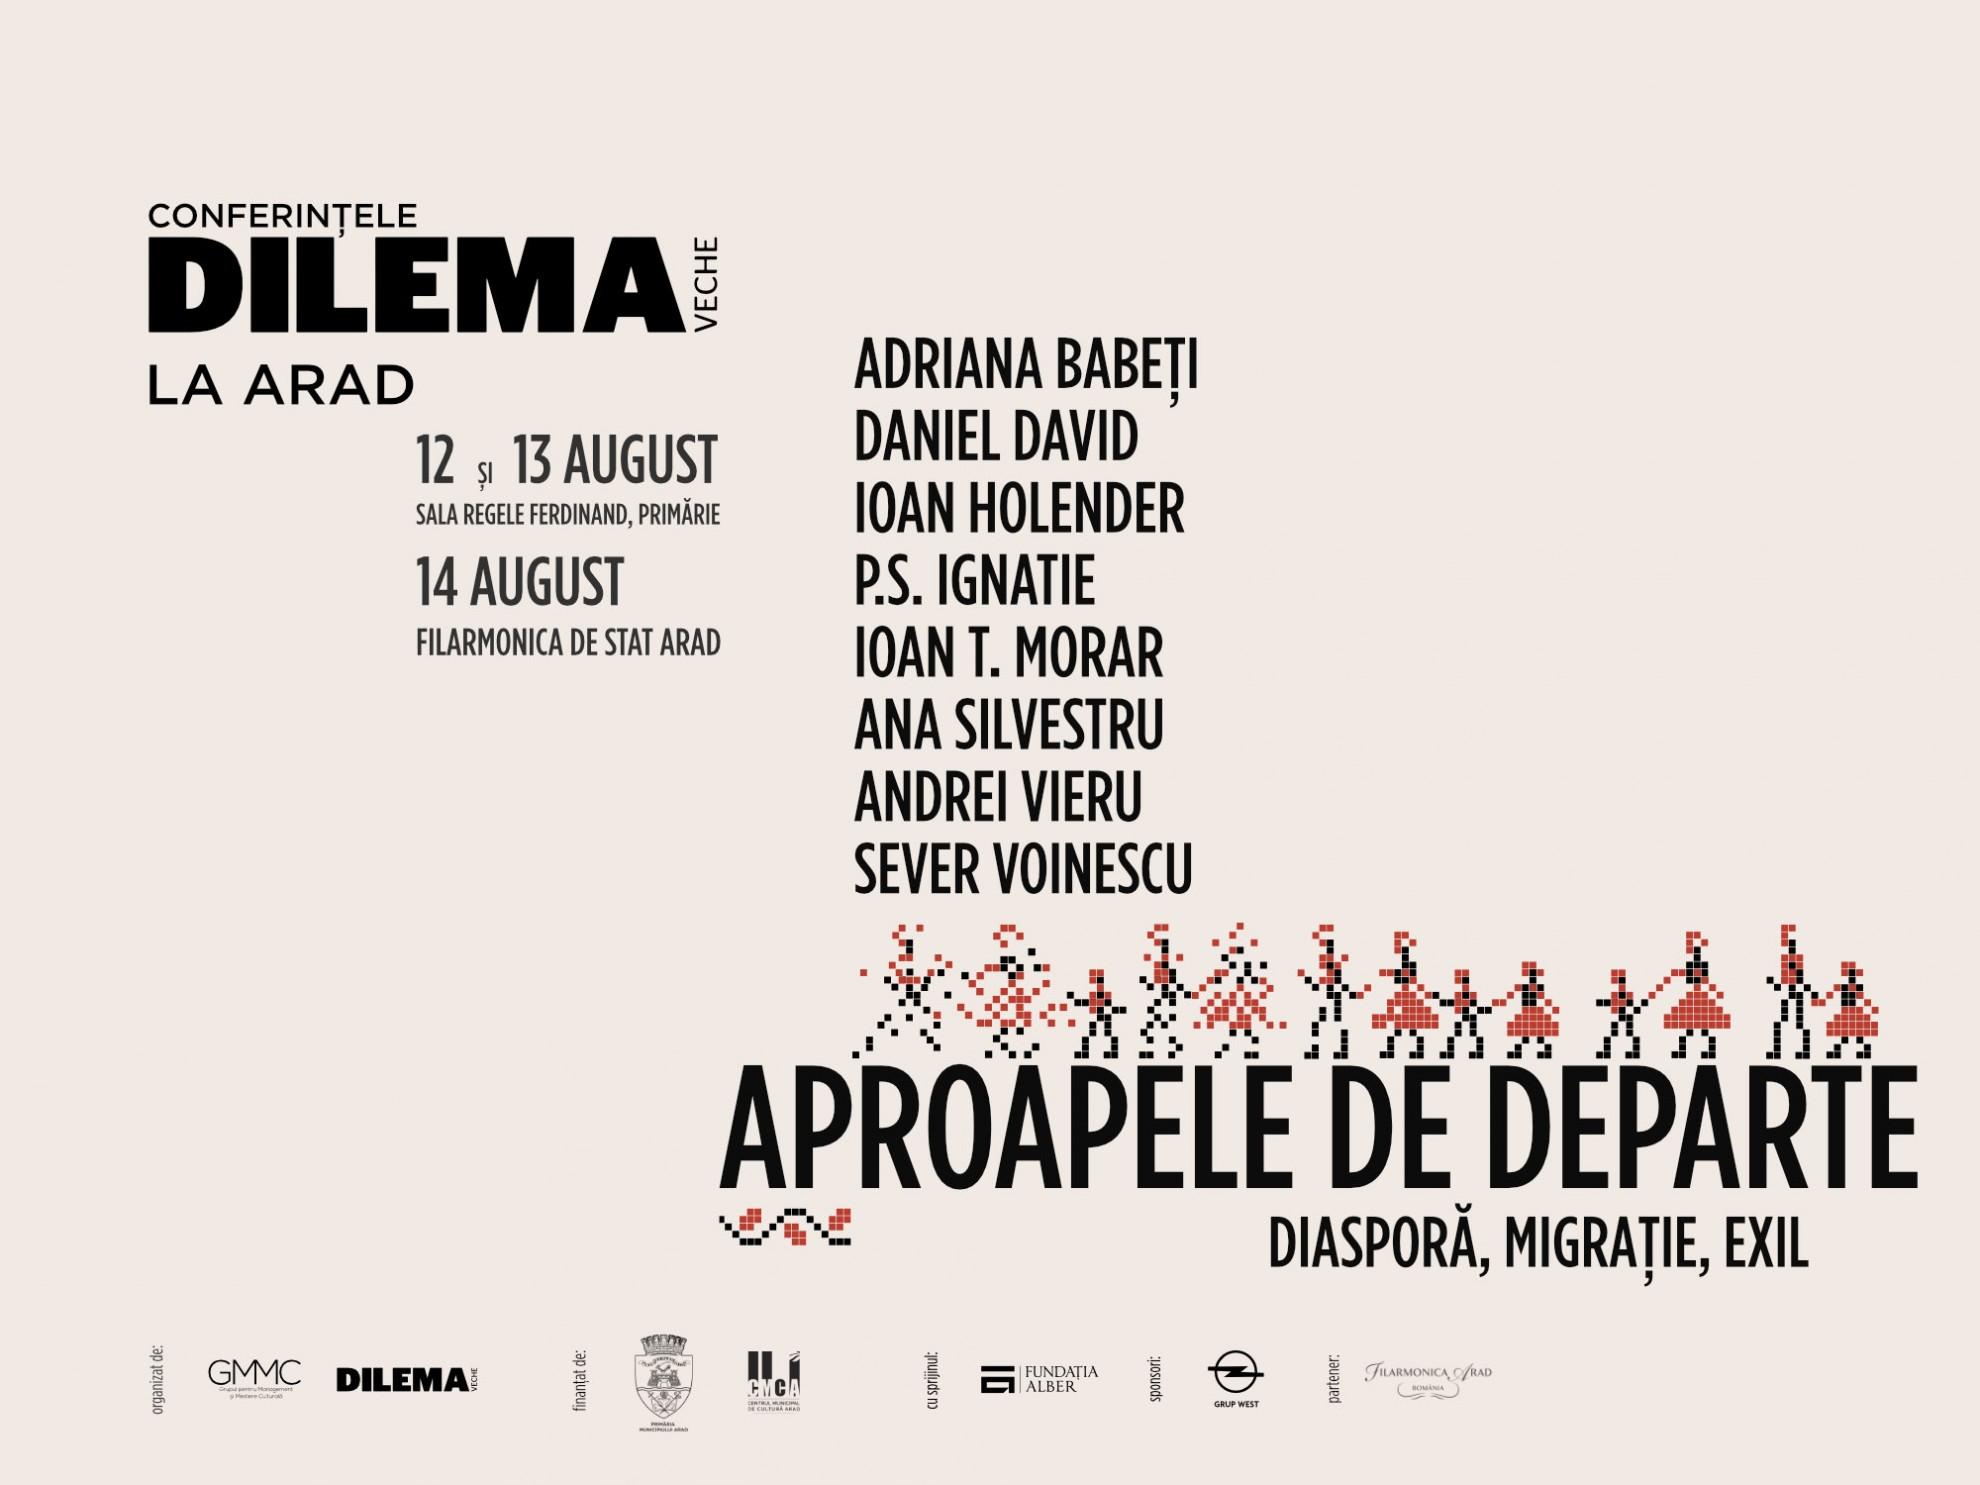 12-14 august: Conferințele Dilema veche revin la Arad